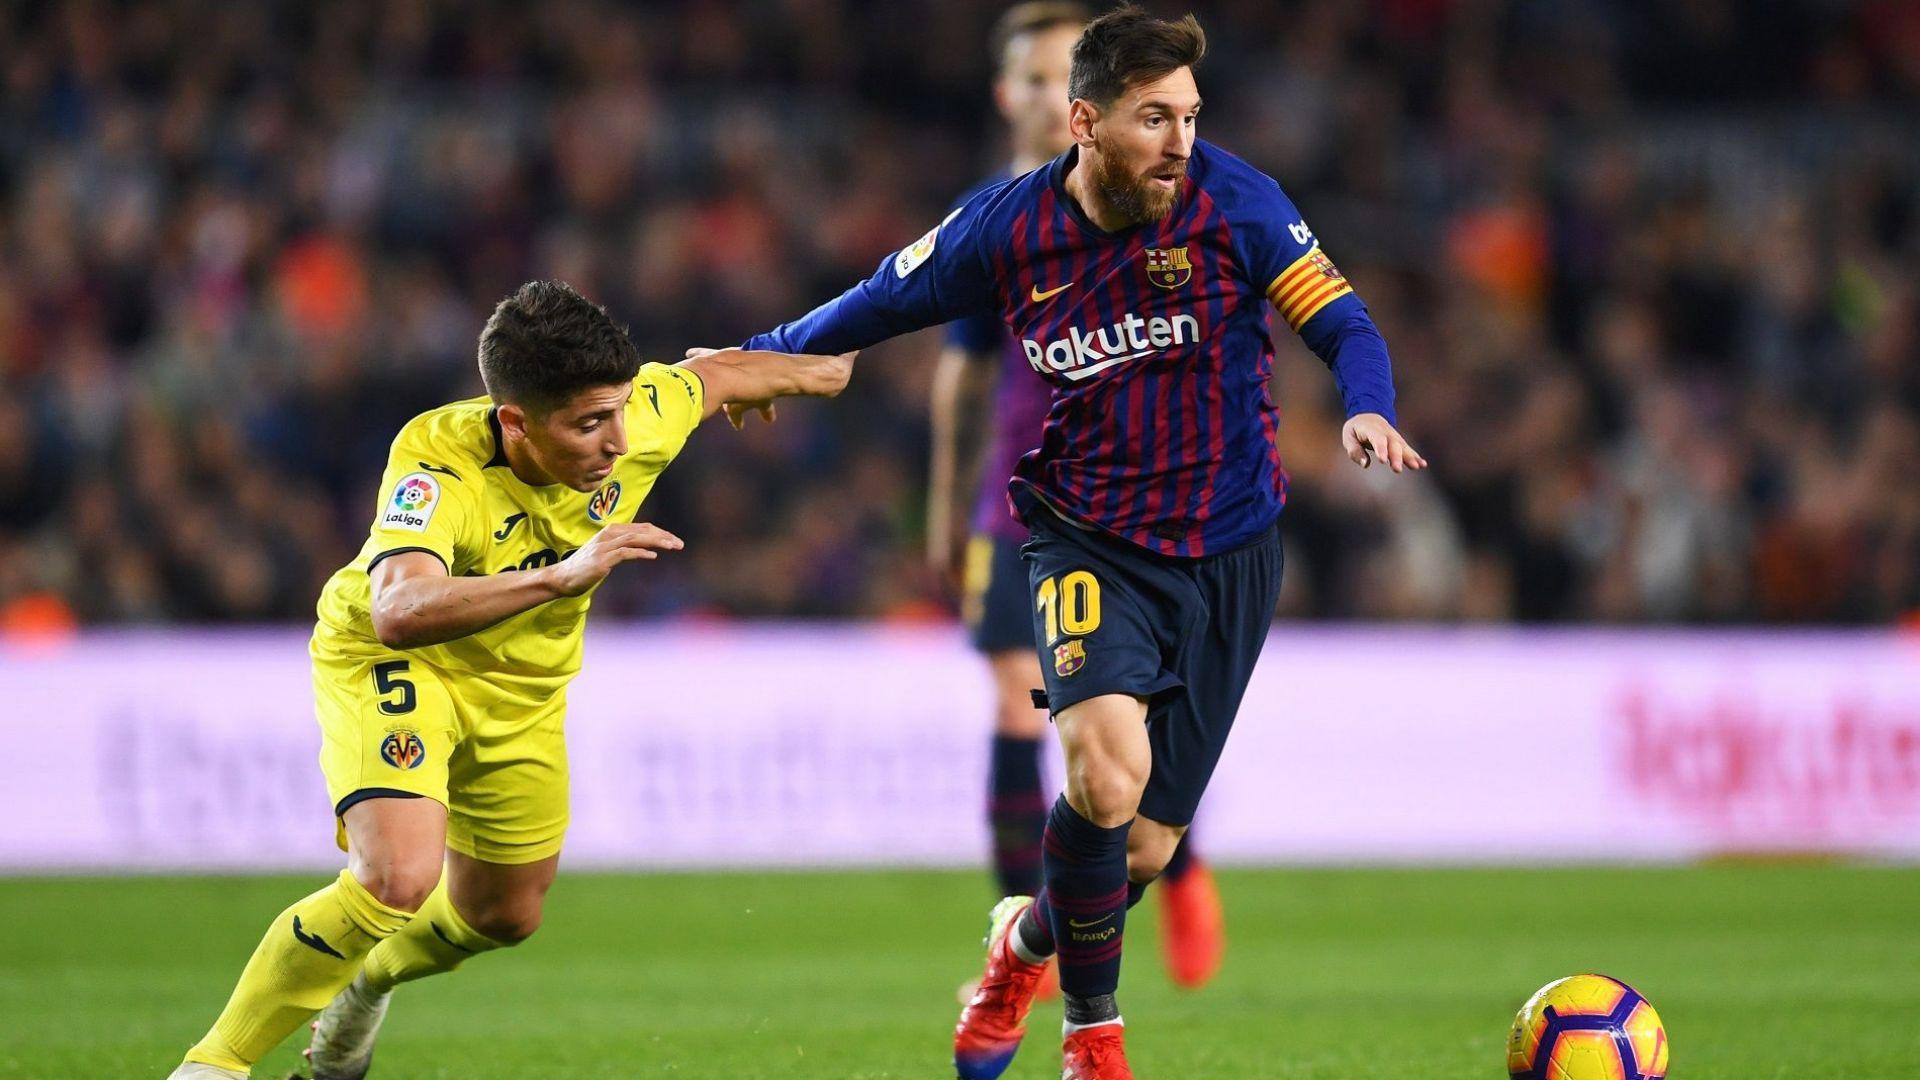 """Жълтата подводница"" не затрудни Барселона"